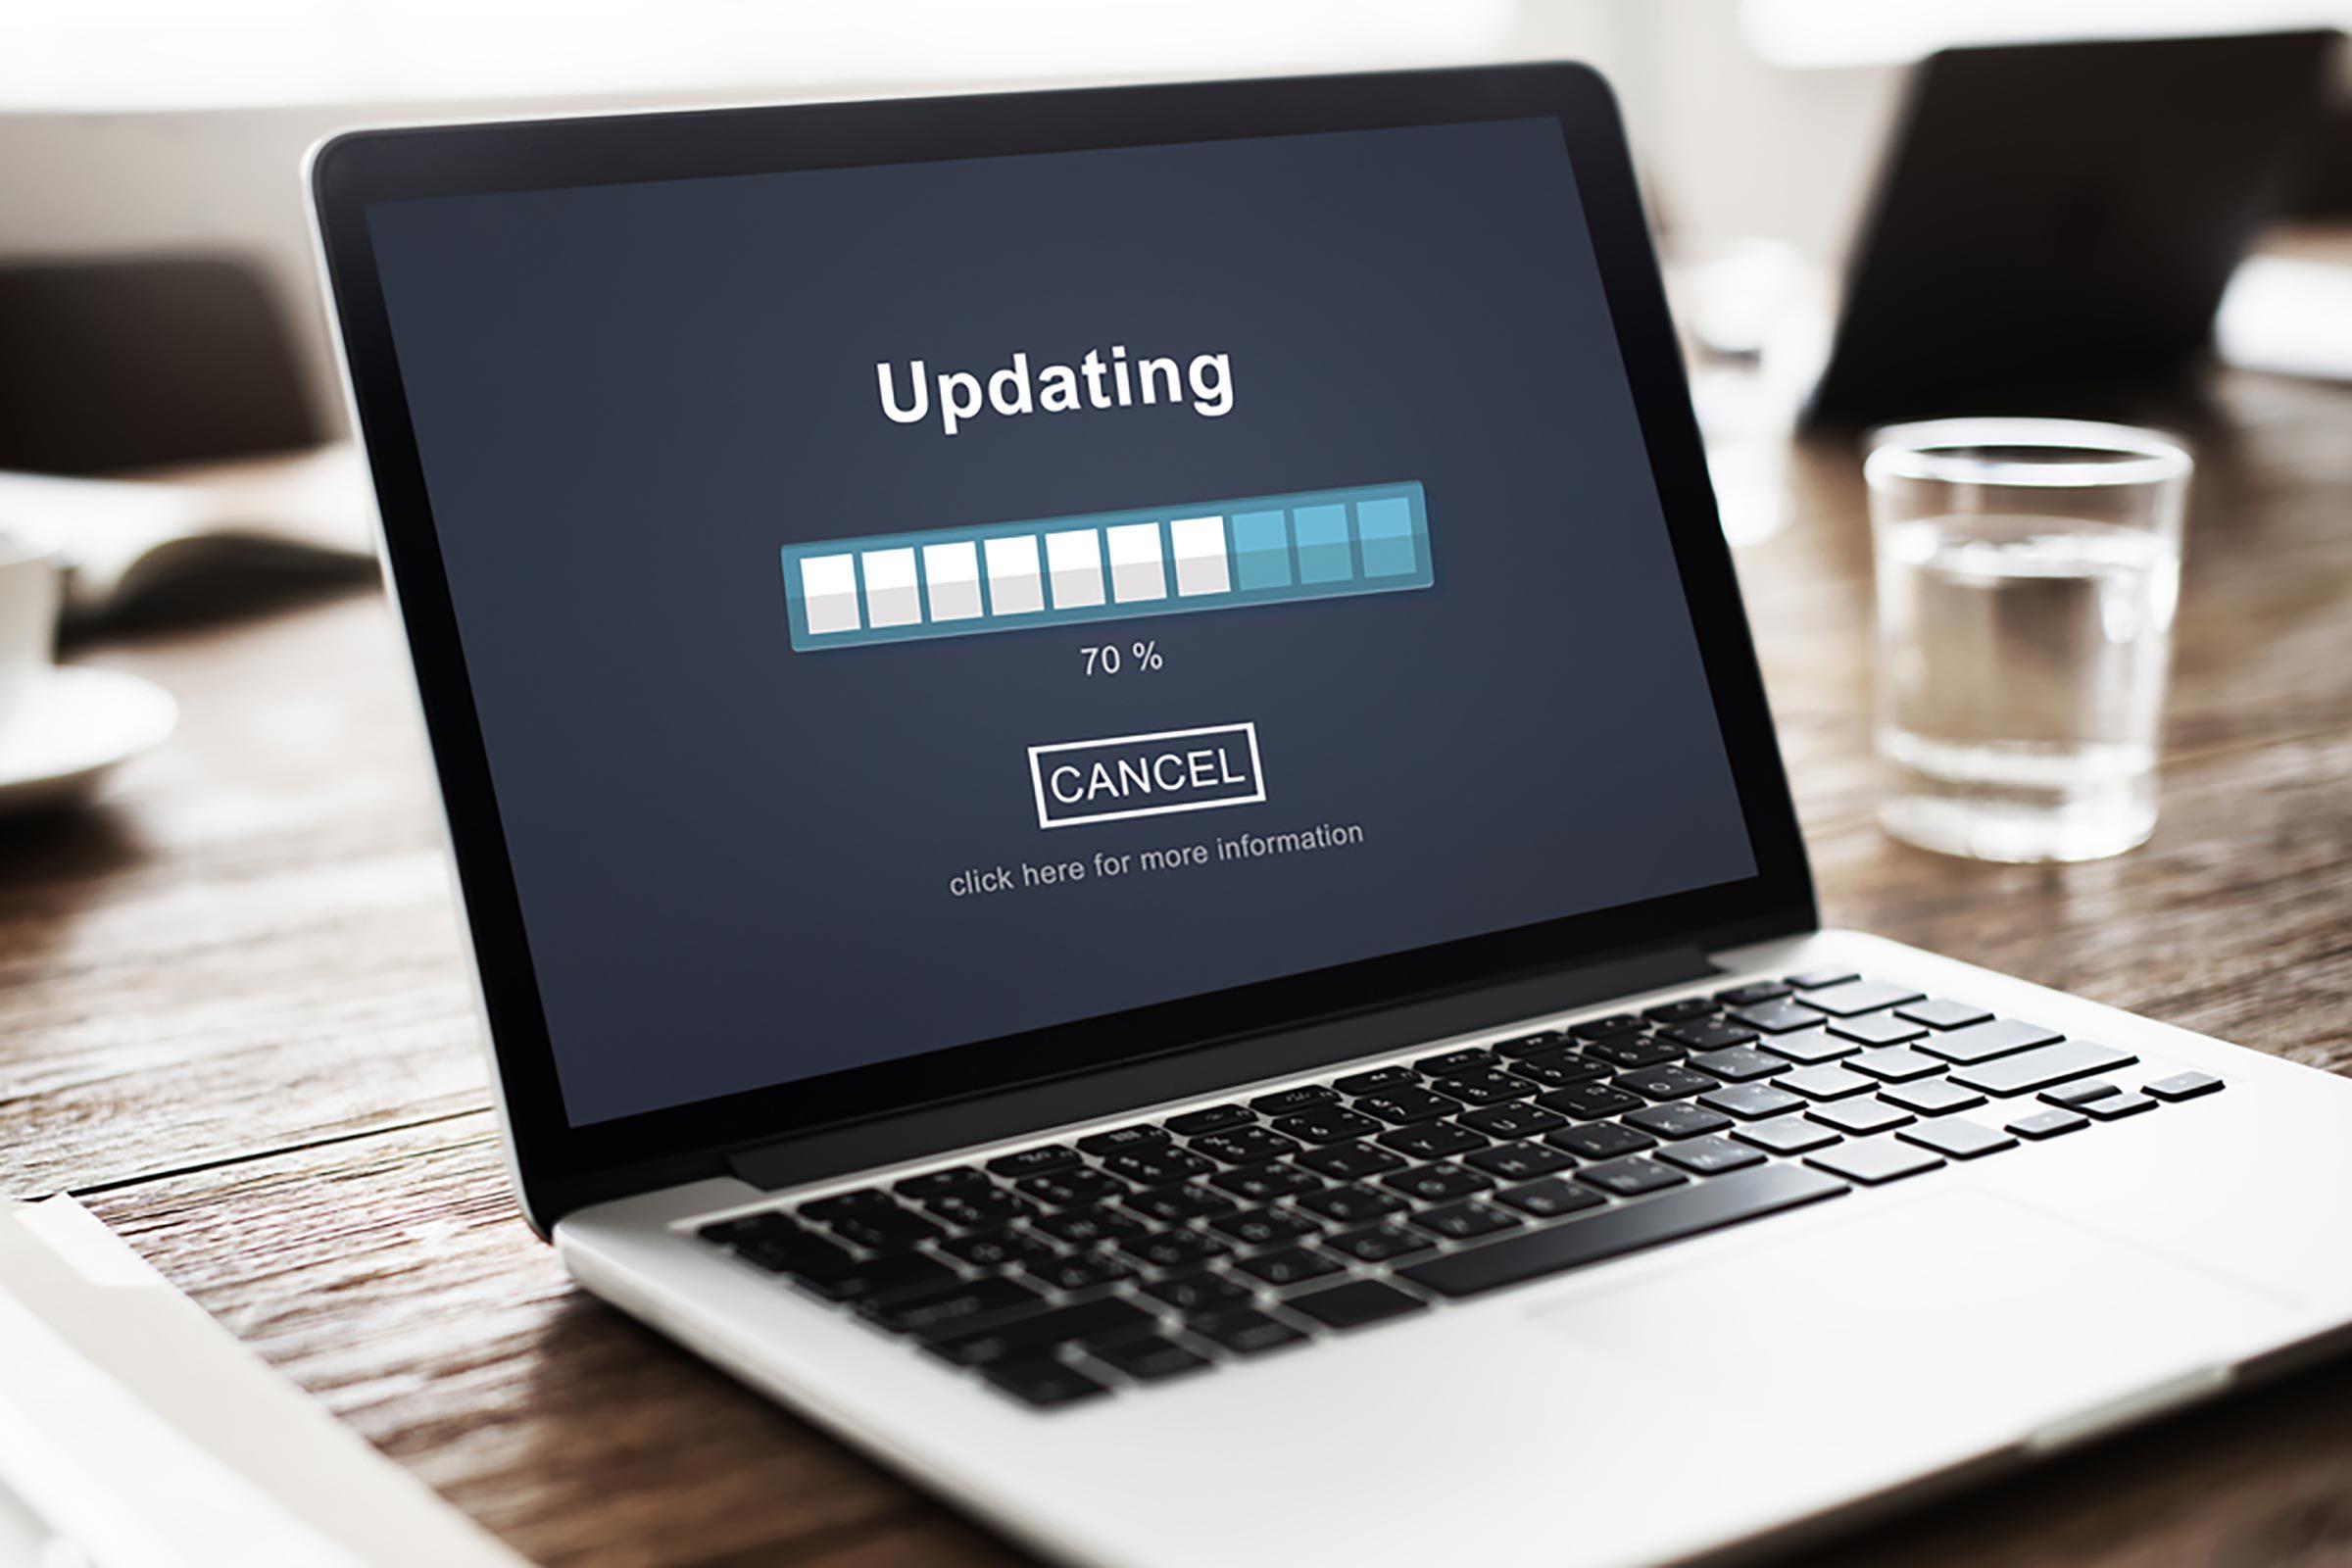 laptopupdate